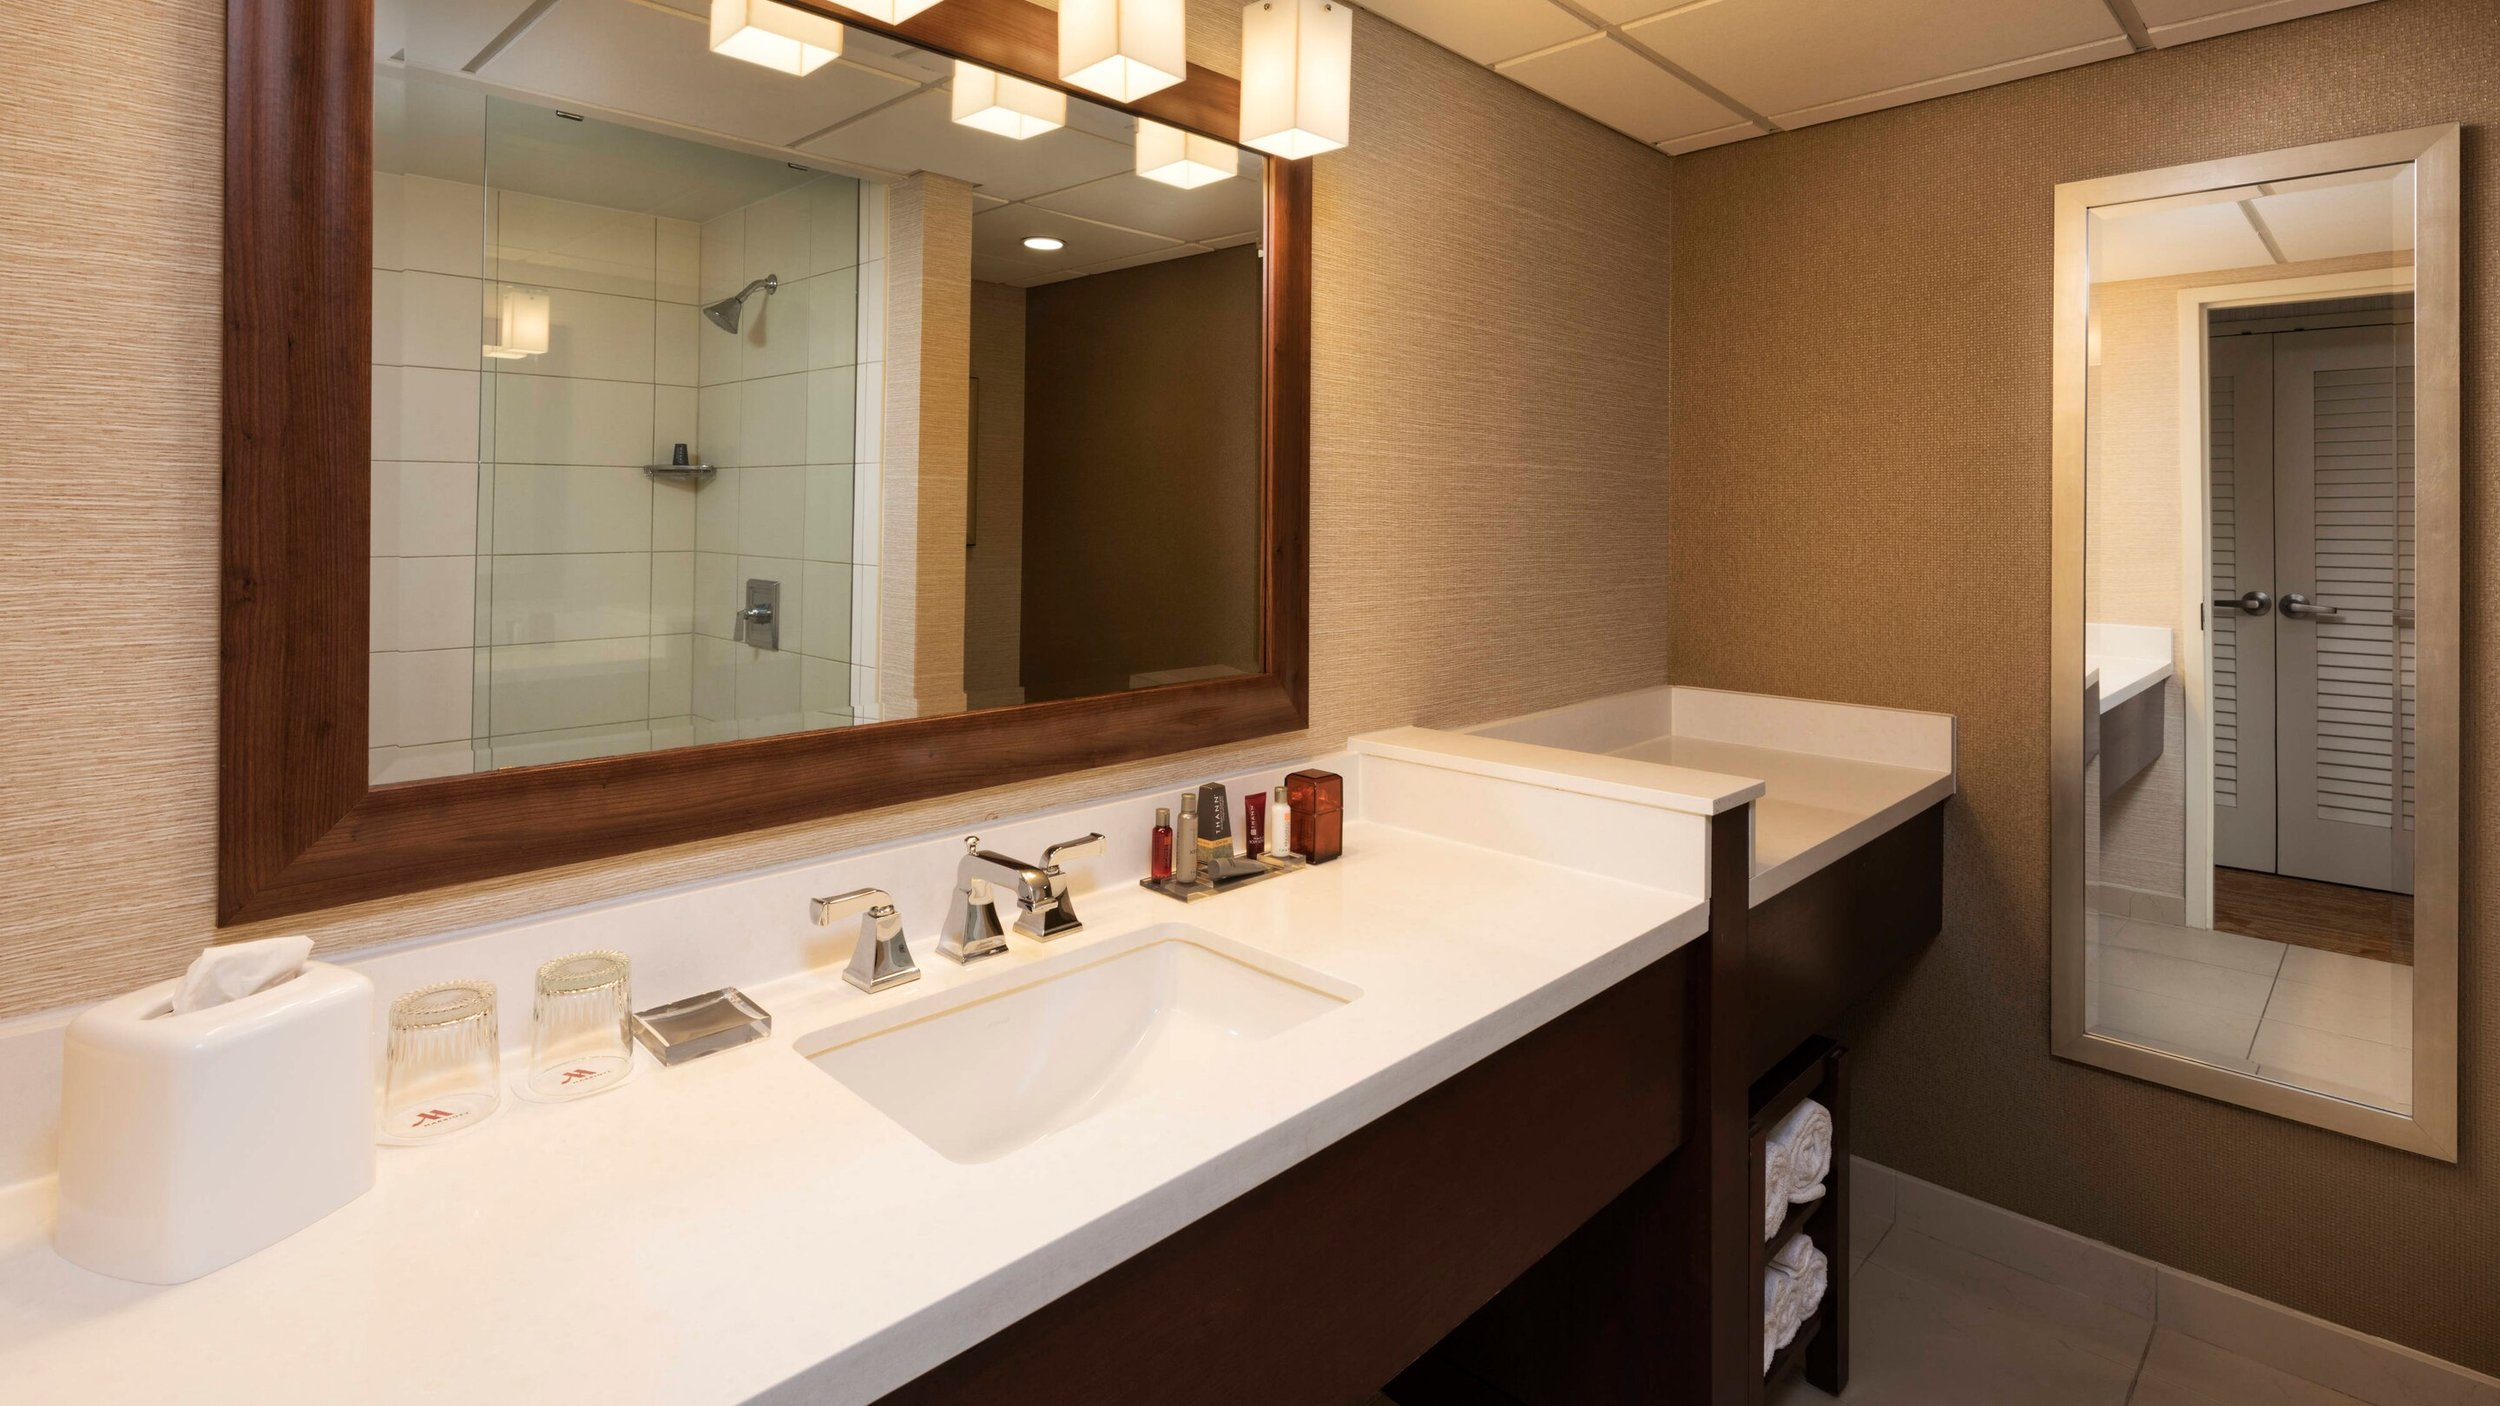 mspnw-bathroom-0066-hor-wide.jpg